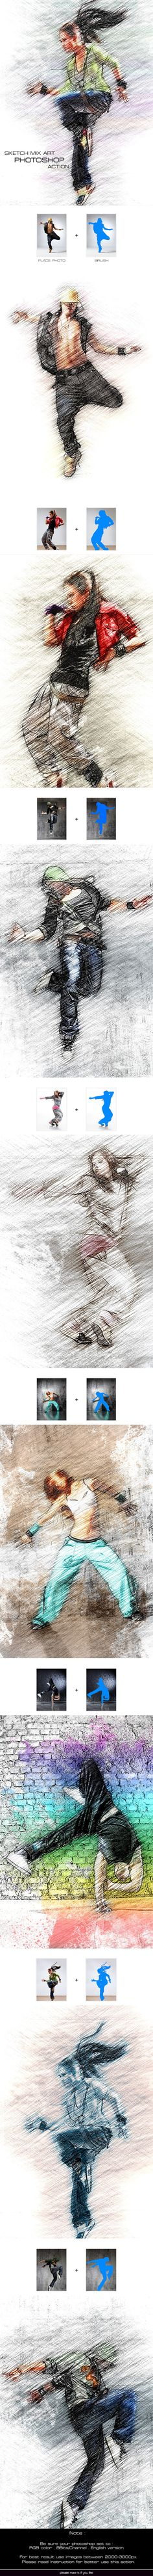 Sketch Mix Art - Photoshop Action #photoeffect Download: http://graphicriver.net/item/sketch-mix-art-photoshop-action/12066884?ref=ksioks